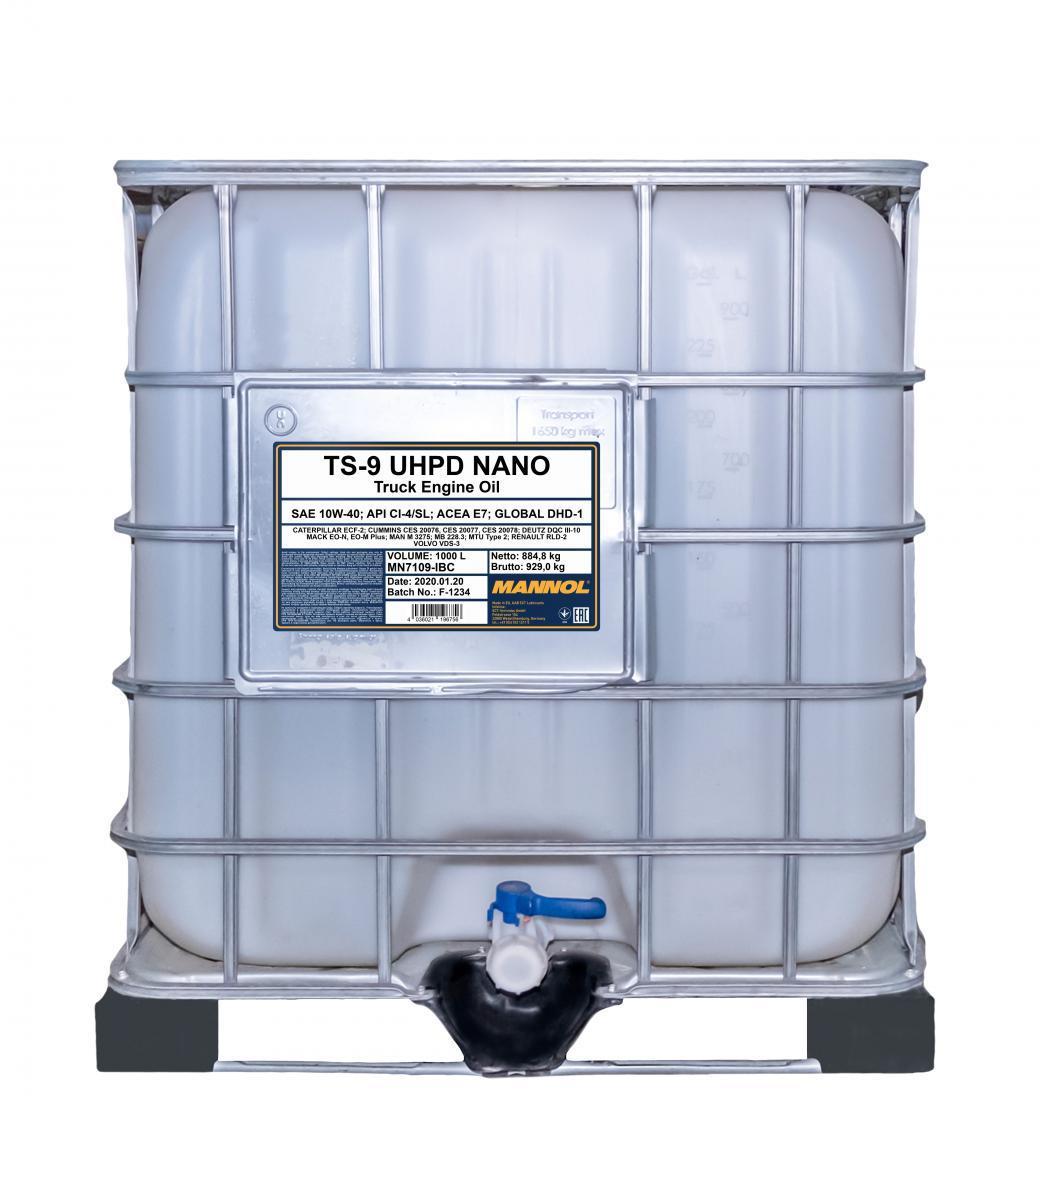 MN7109-IBC MANNOL TS-9, UHPD Nano 10W-40, 1000l, Teilsynthetiköl Motoröl MN7109-IBC günstig kaufen